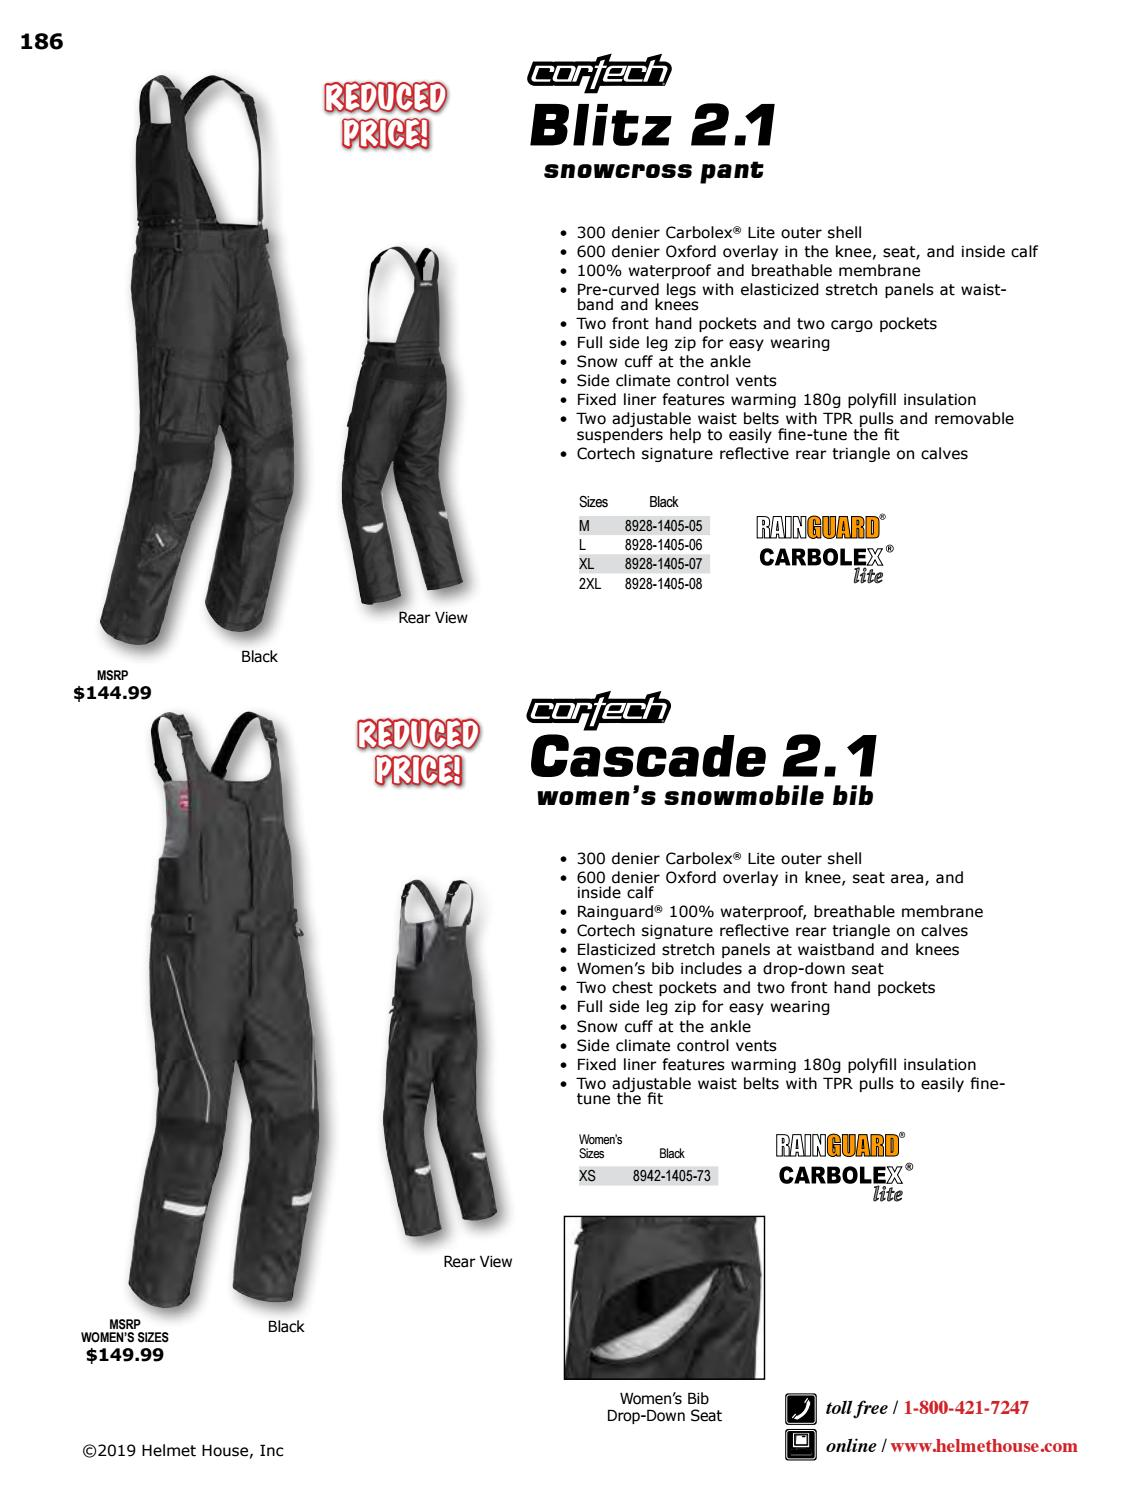 Cortech Blitz 2.1 Snow Pants XXL Black 8928-1405-08